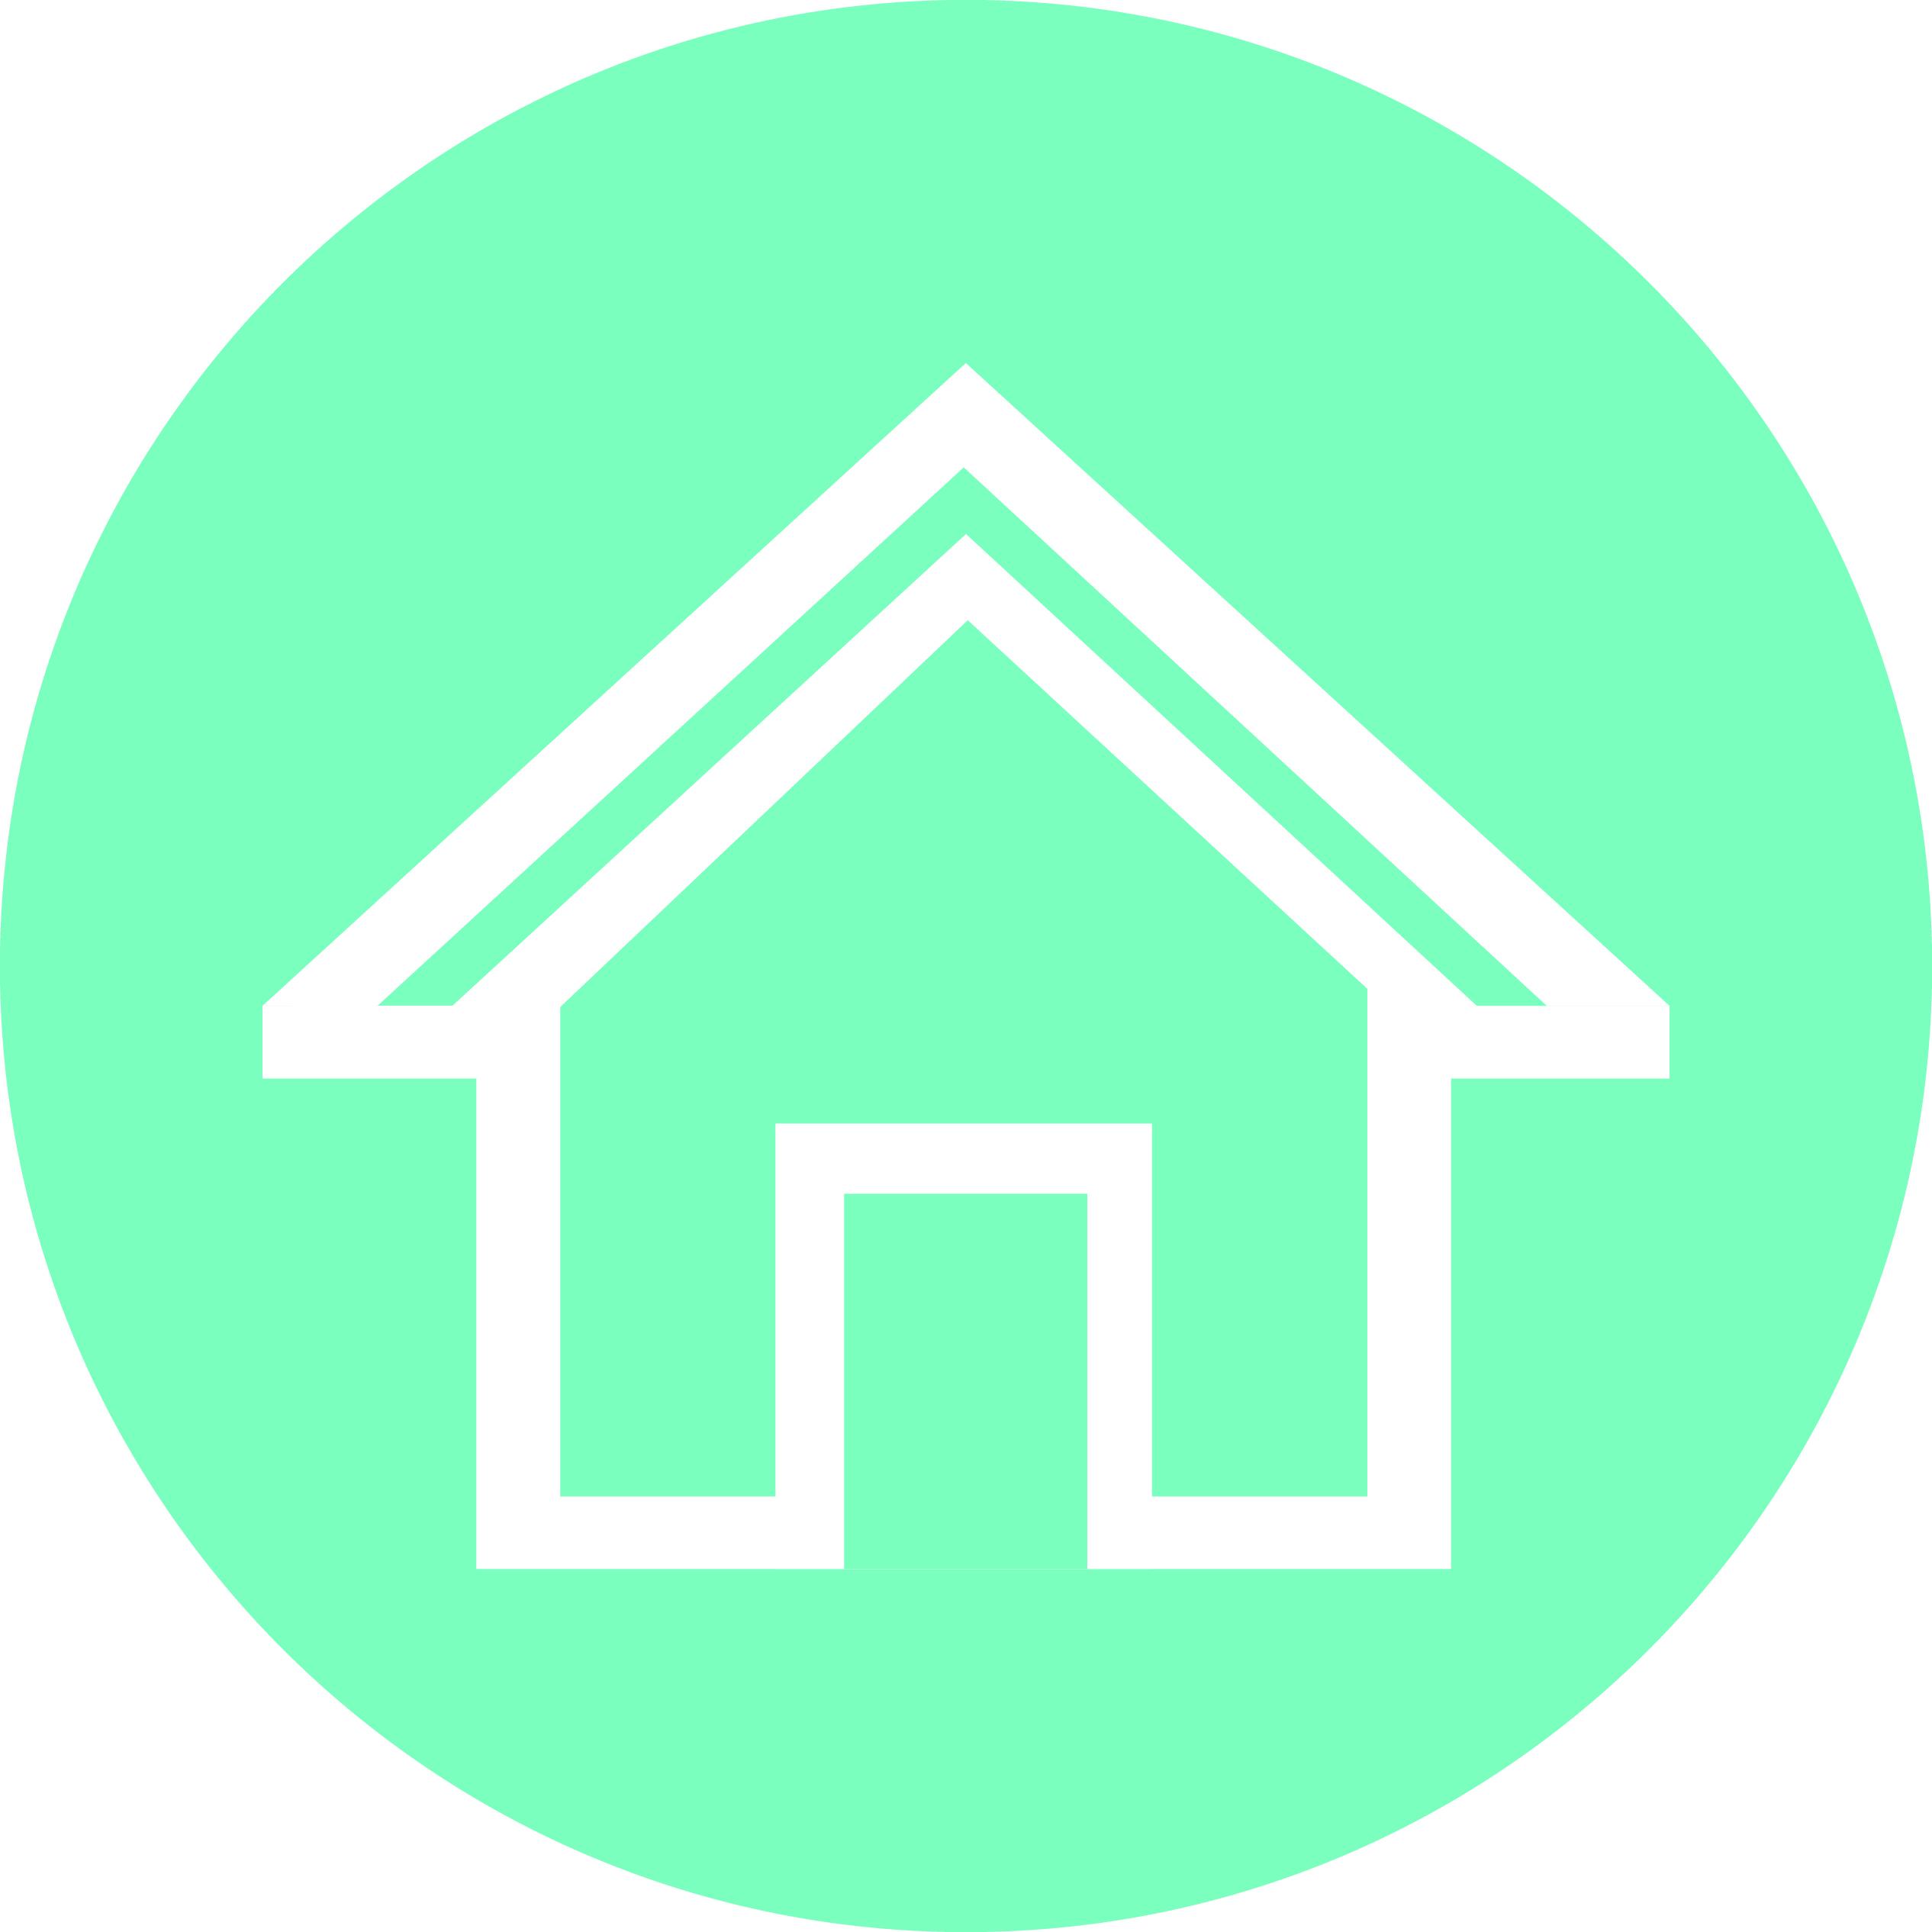 picto_logement